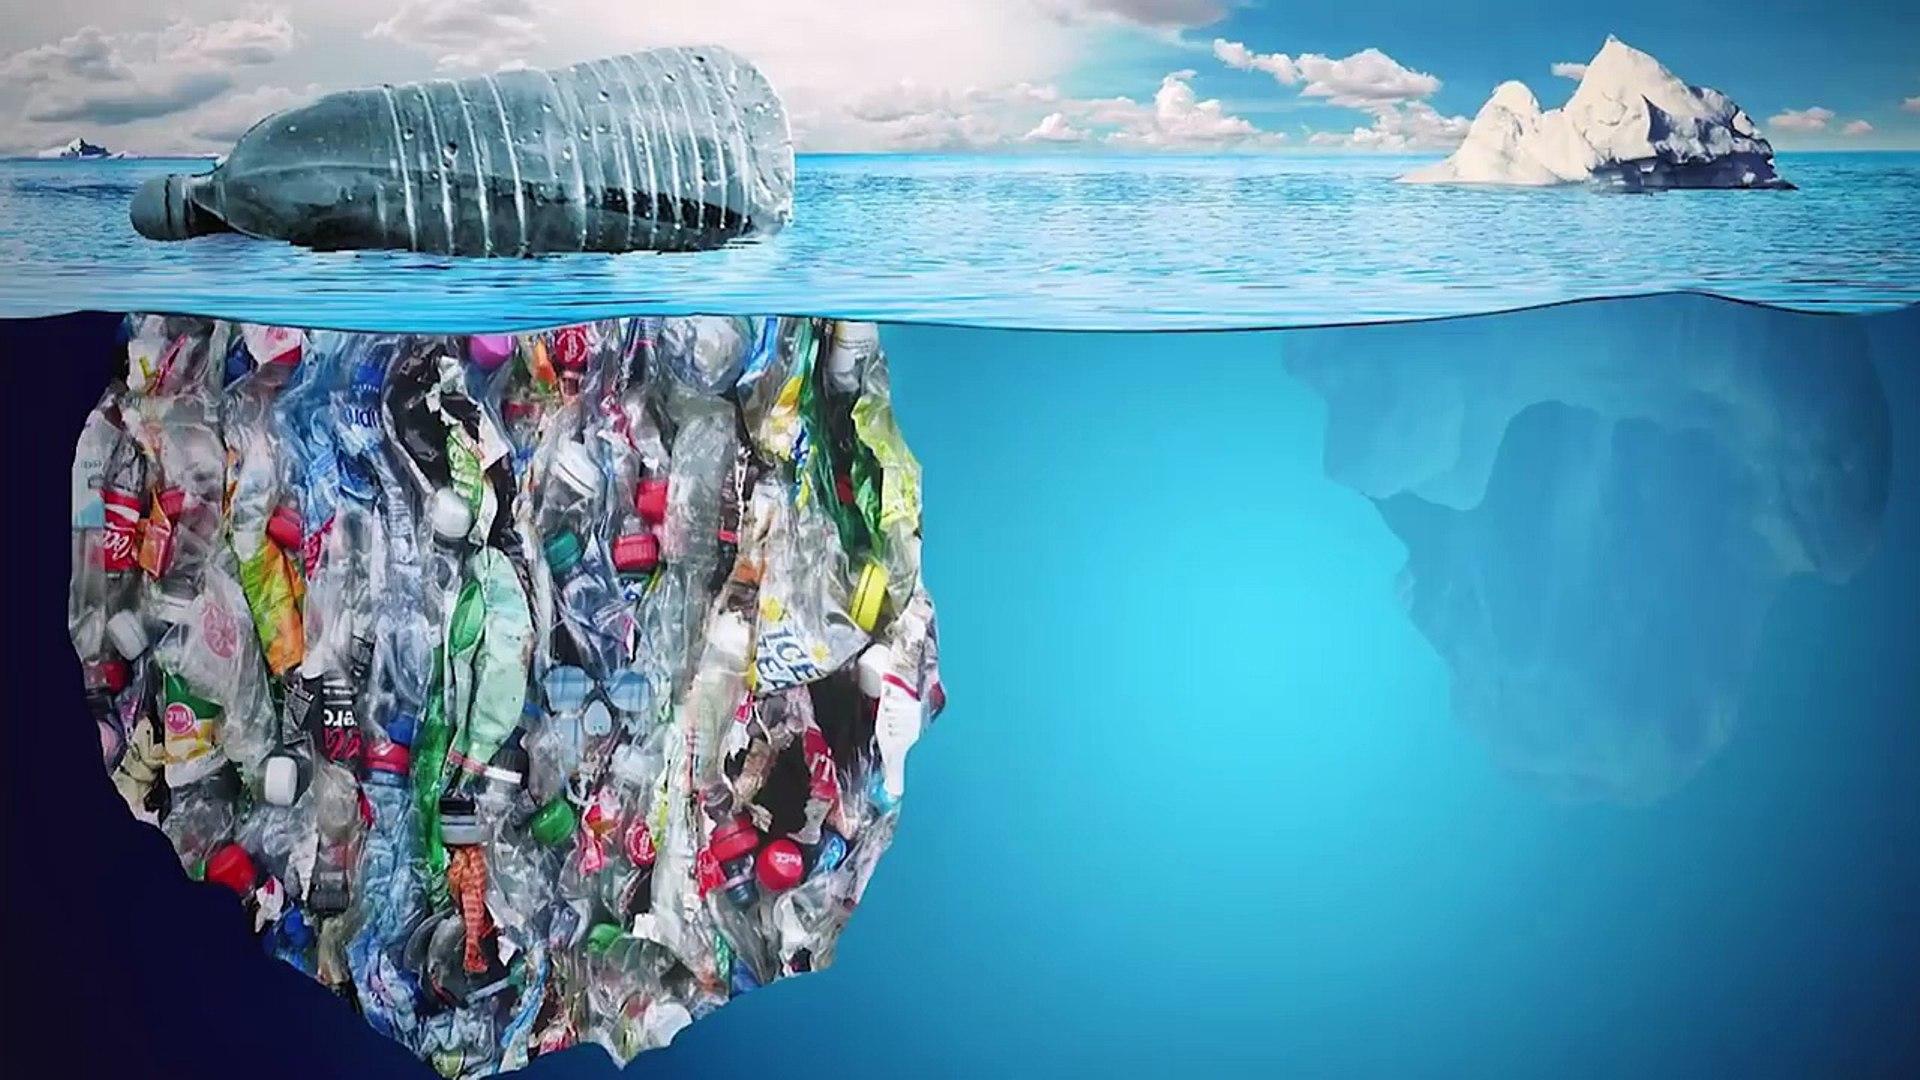 EU Bans Single-Use Plastic by 2021